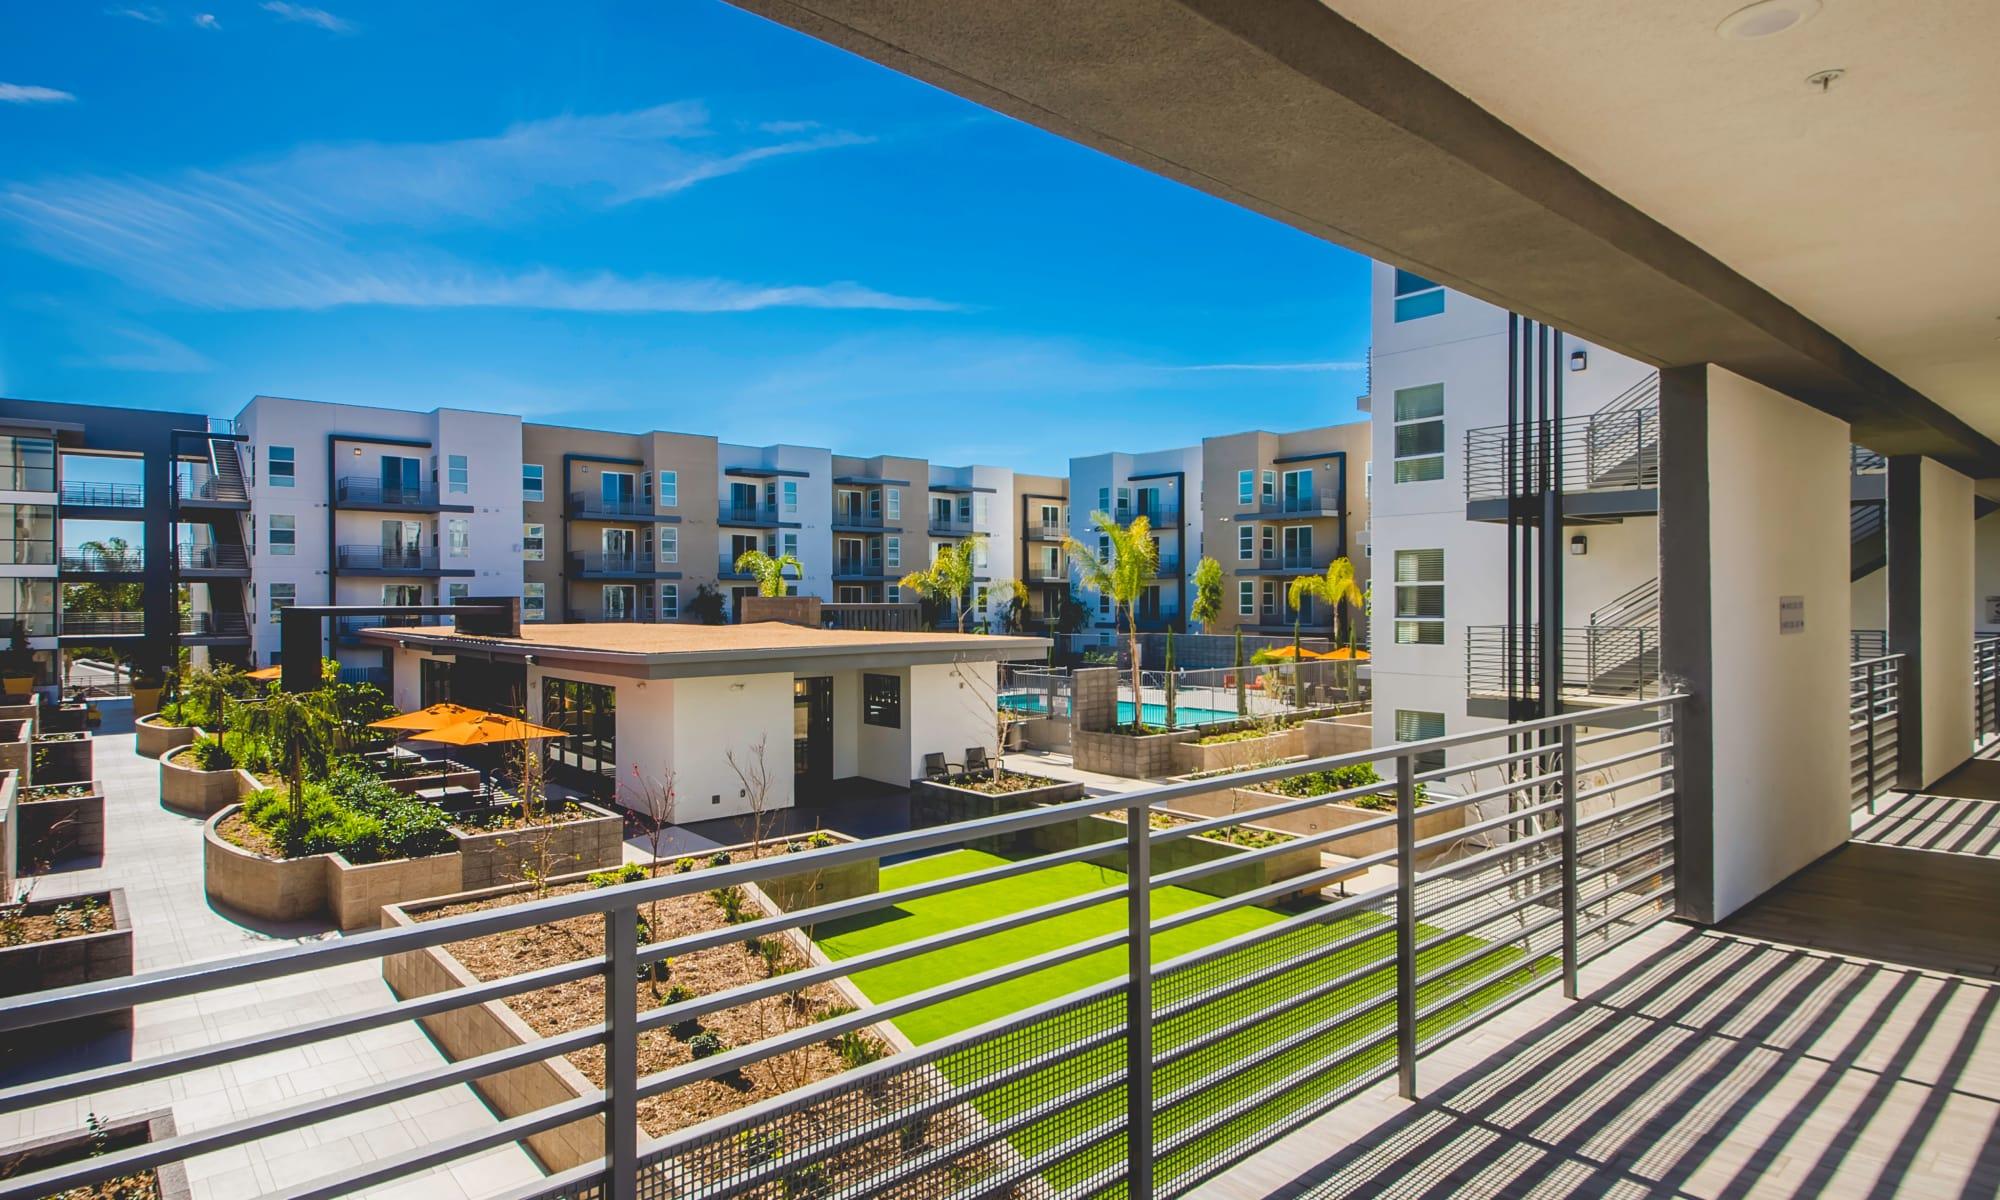 Apartments at IMT Sherman Circle in Van Nuys, California